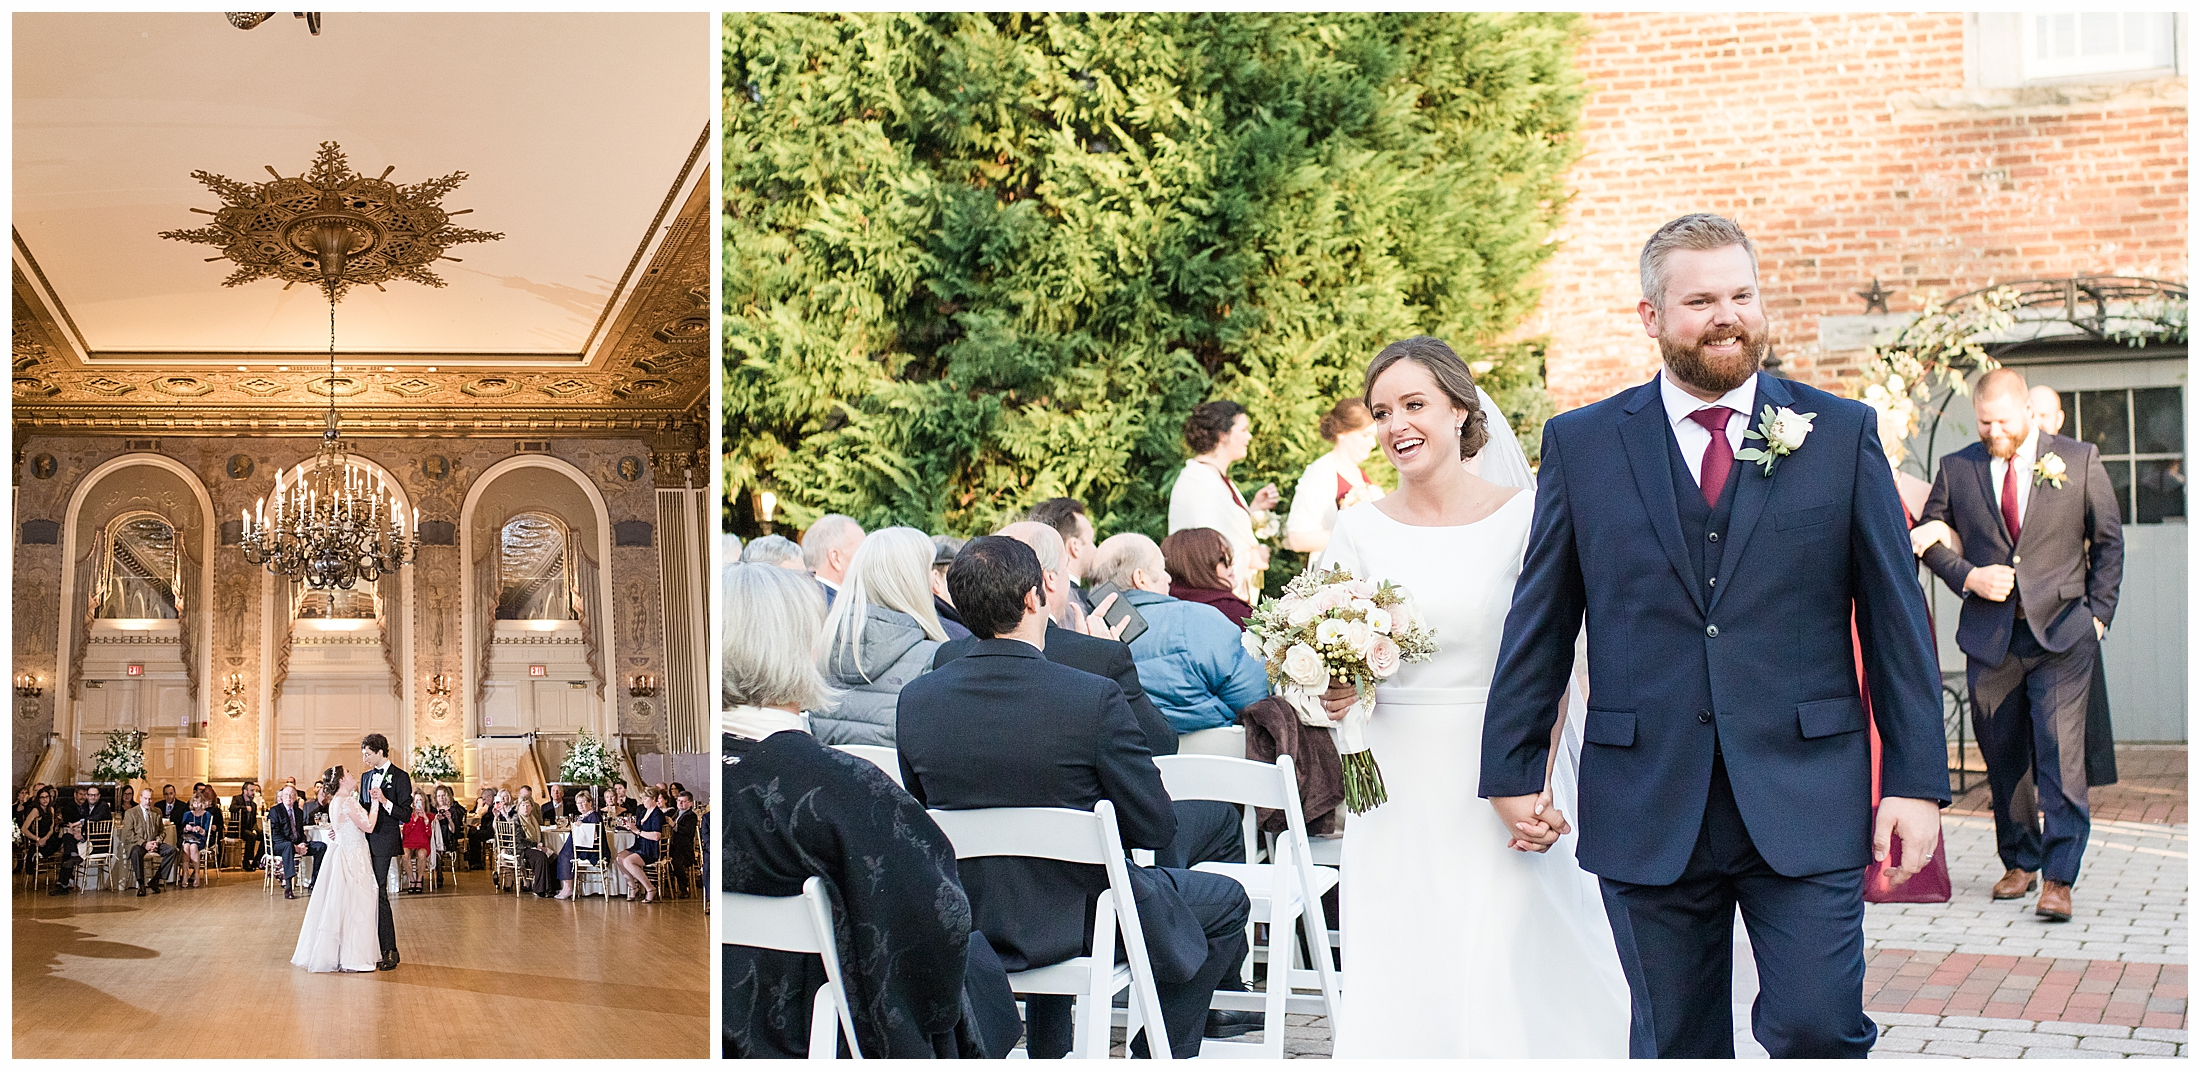 multiple-locations-on-wedding-day-.jpg7.jpg